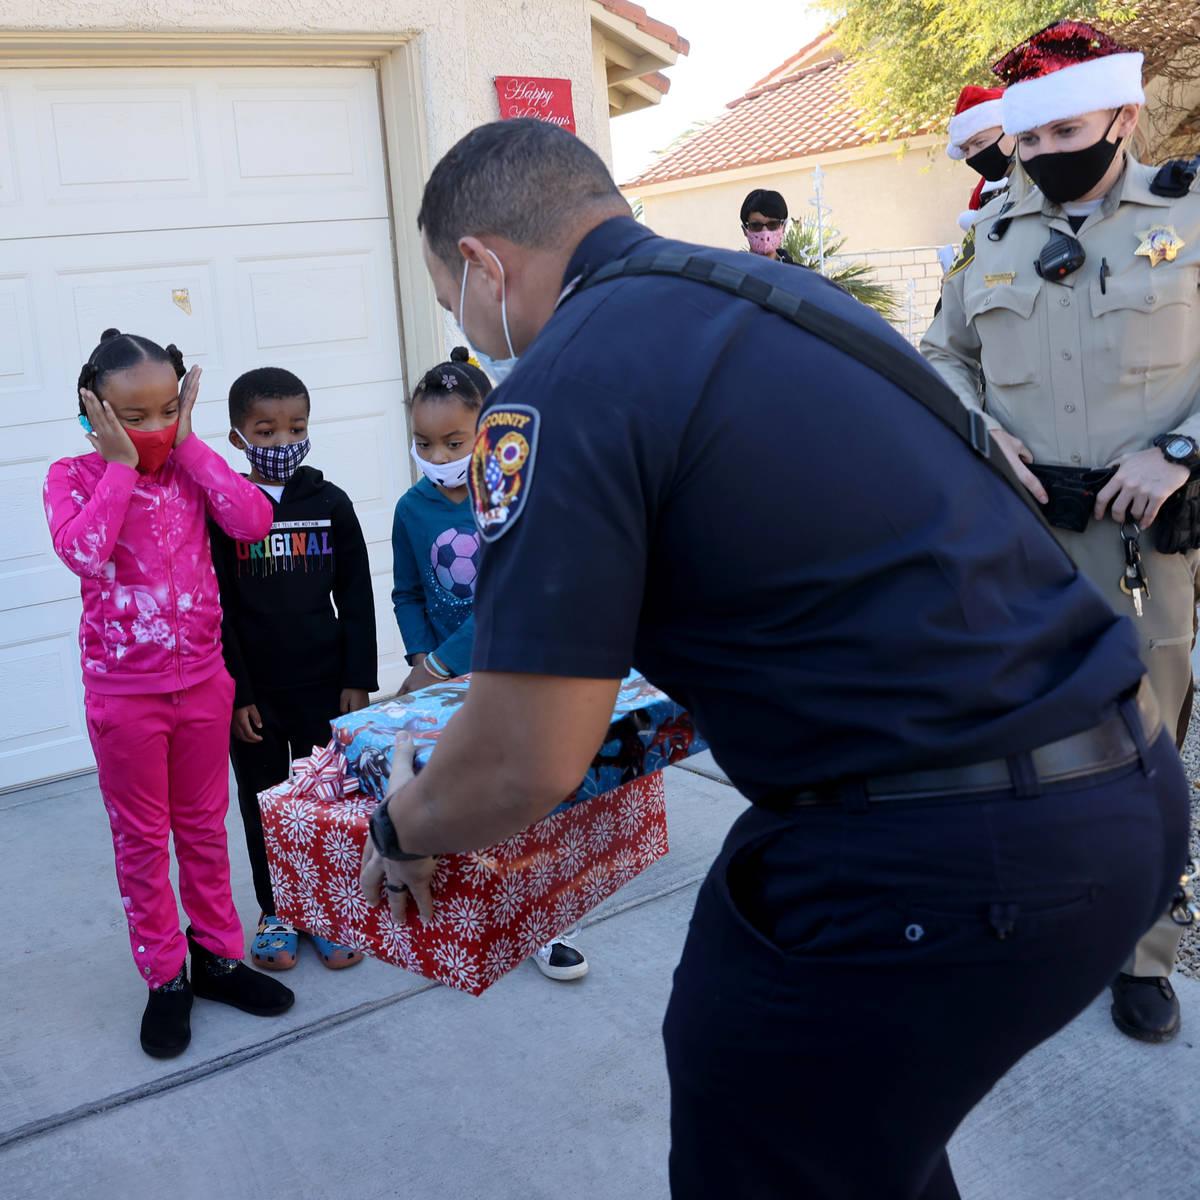 Clark County firefighter Calvin Dean and Las Vegas police officer Meike Dangervil deliver gifts ...